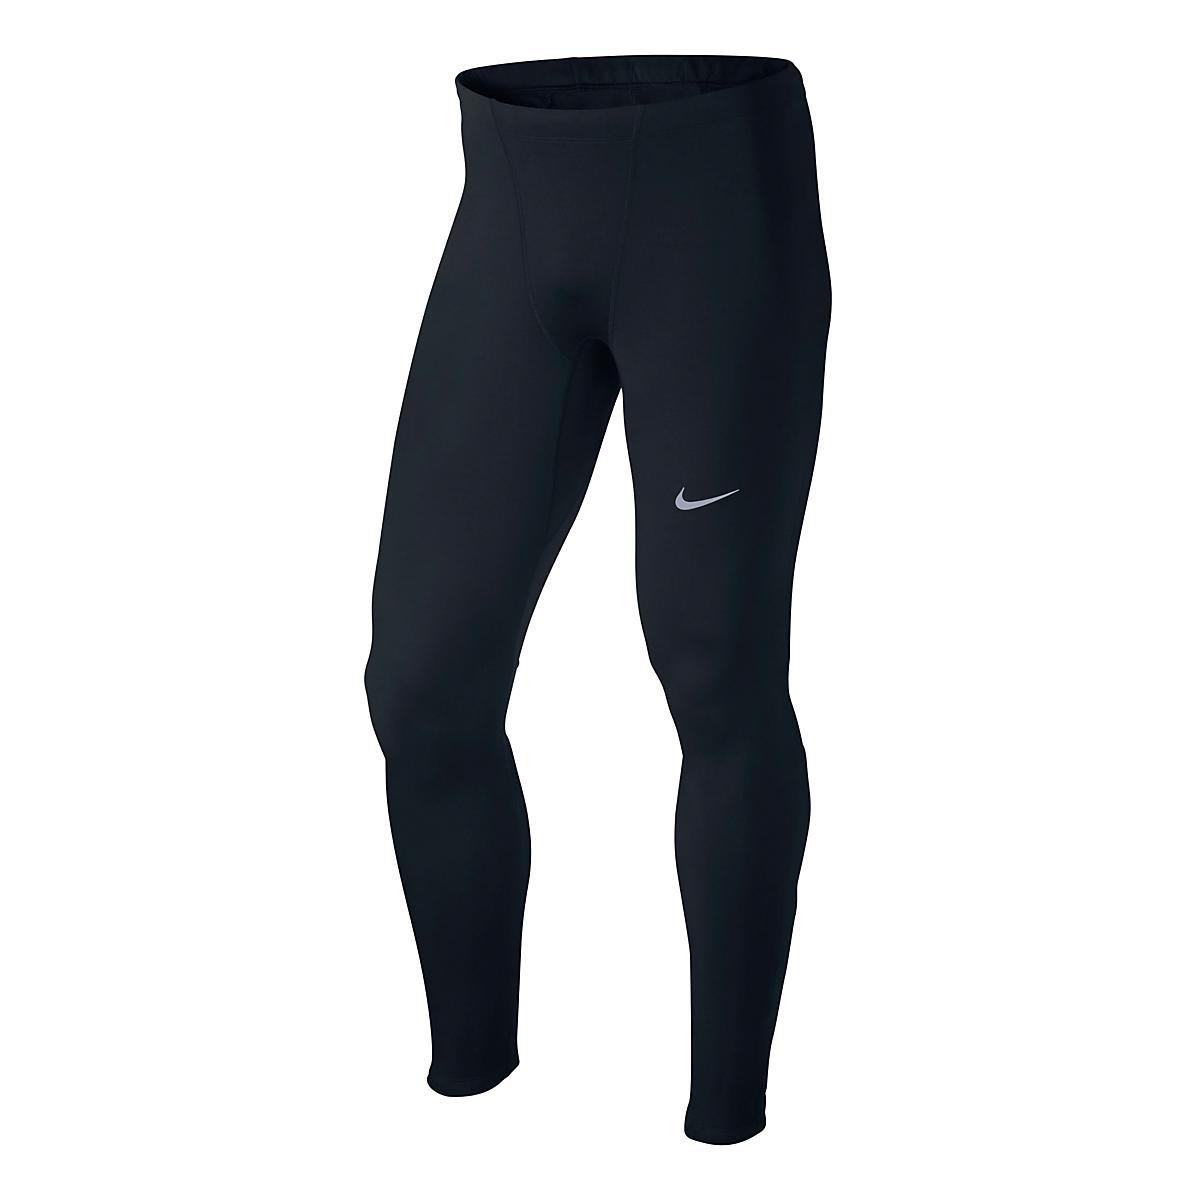 Men's Nike�Dri-Fit Thermal Tight